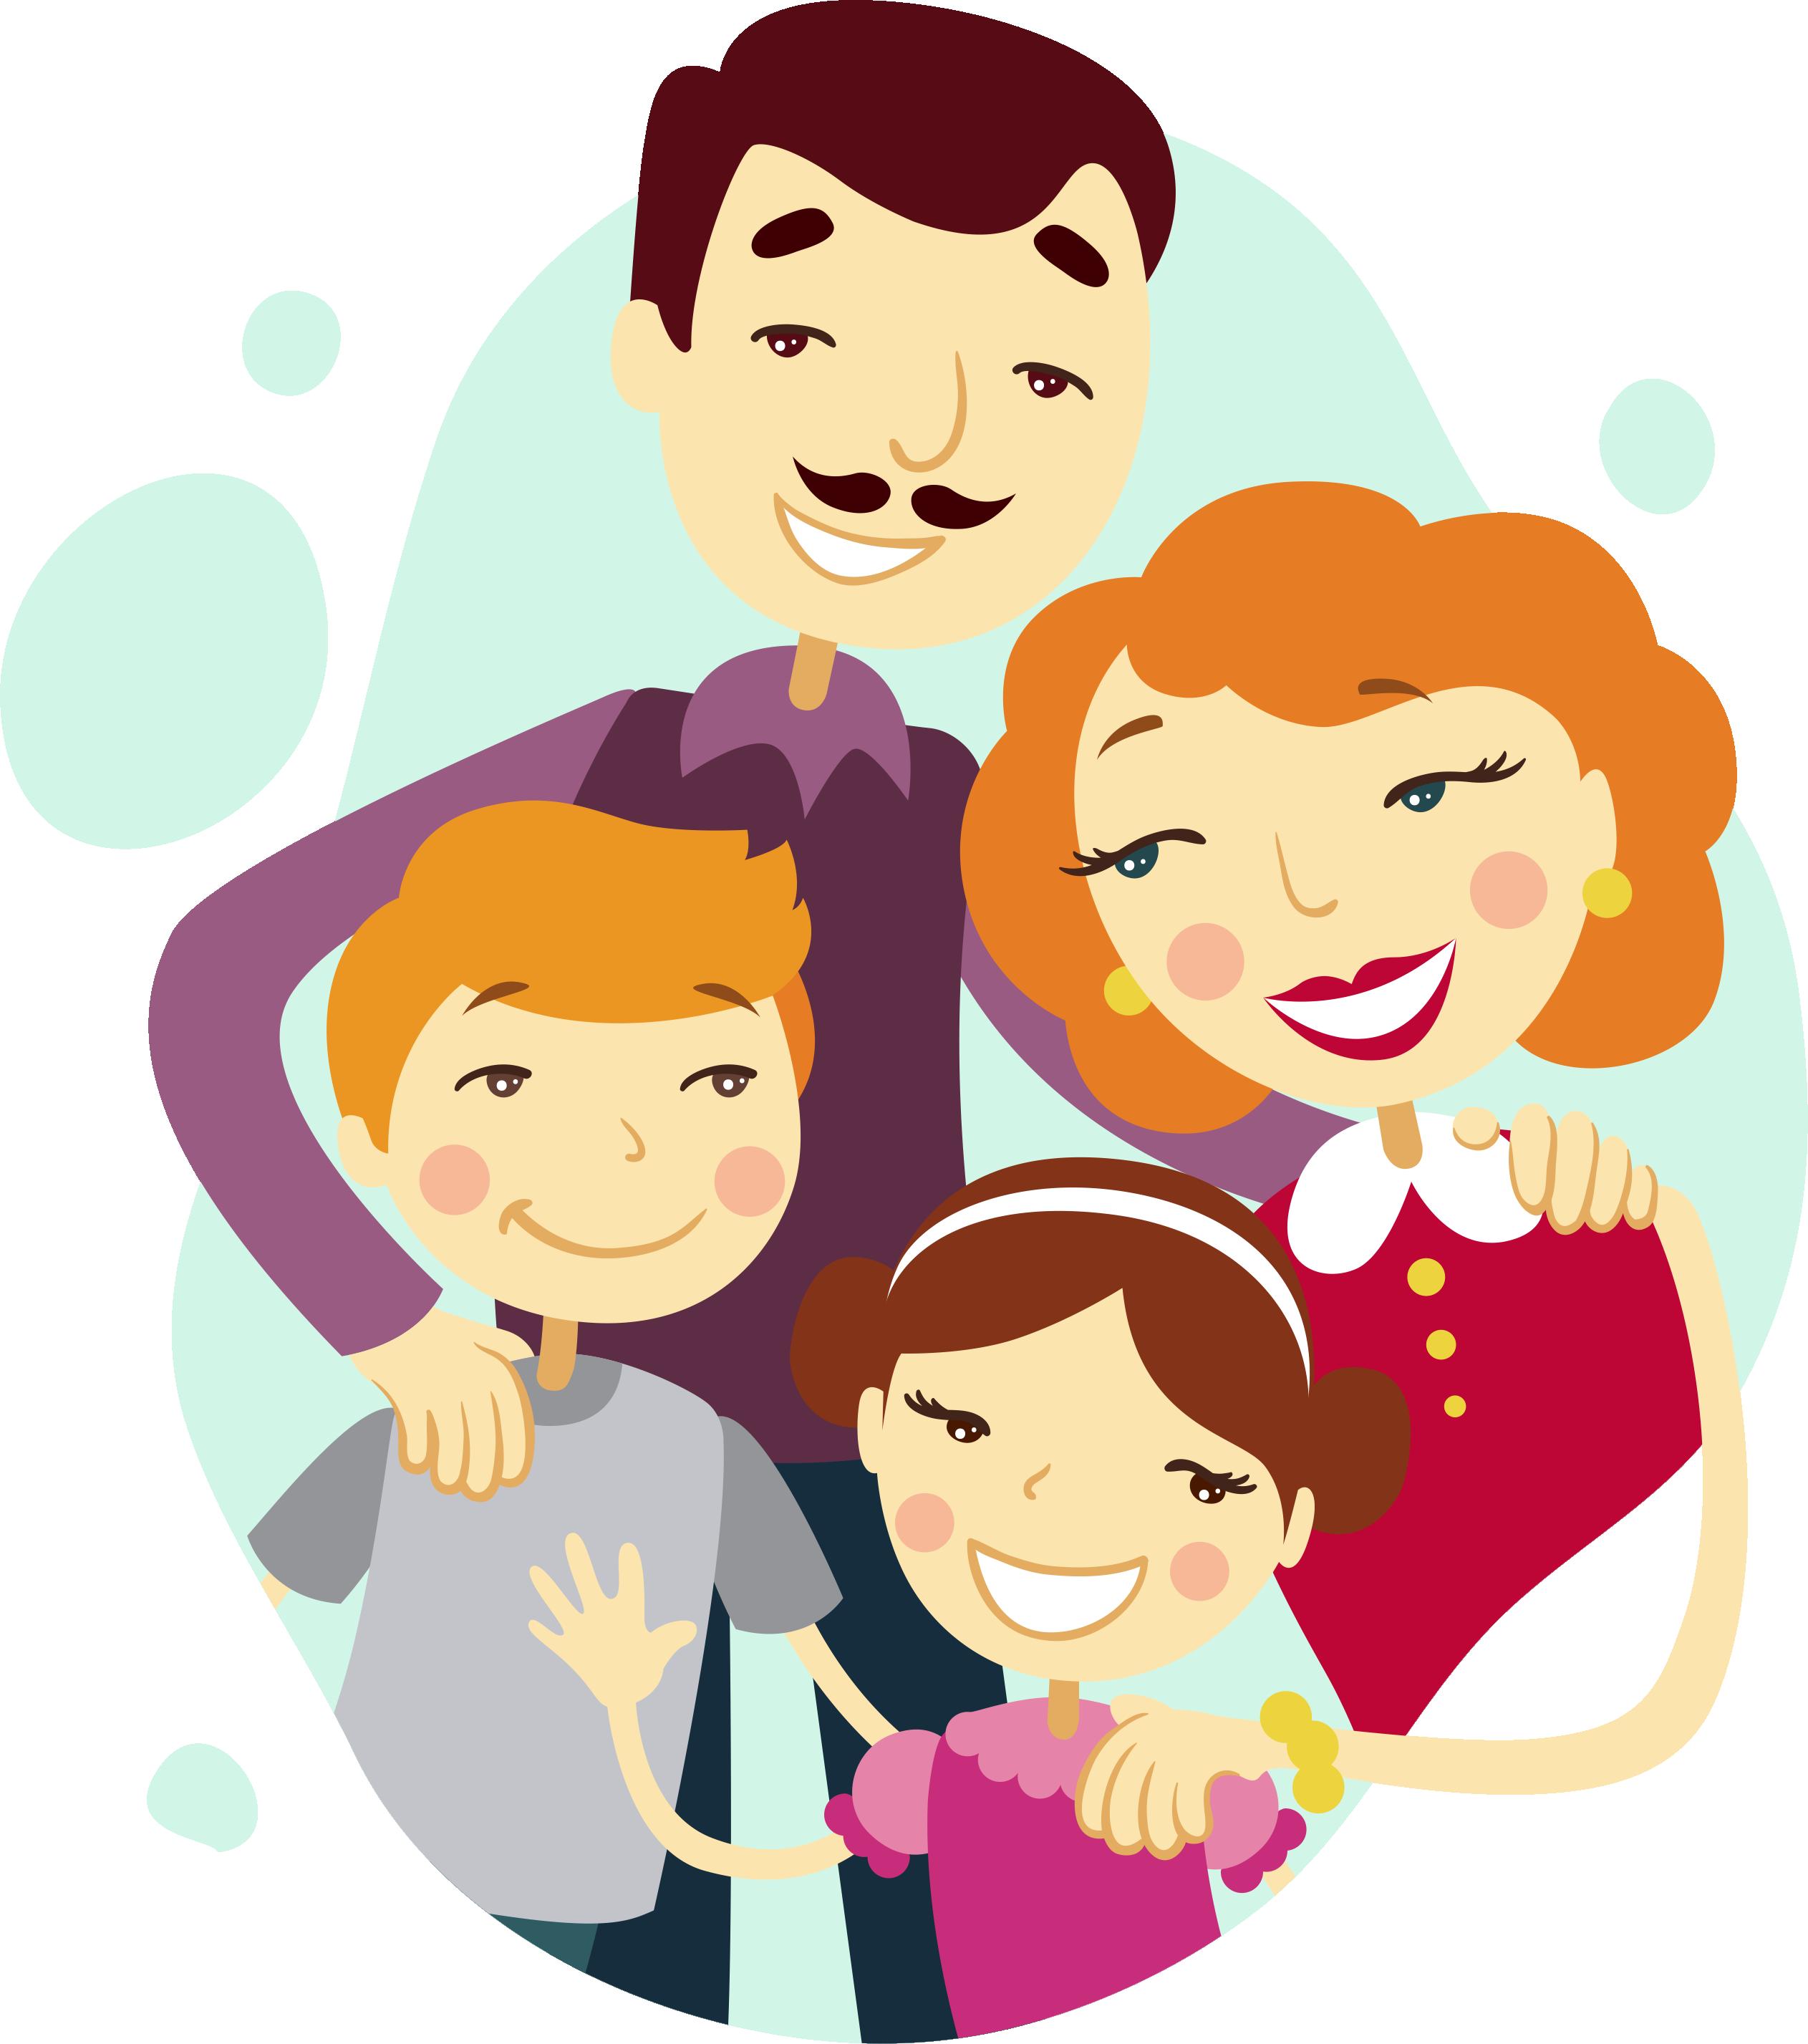 Emotions clipart four basic. Family tree cartoon illustration